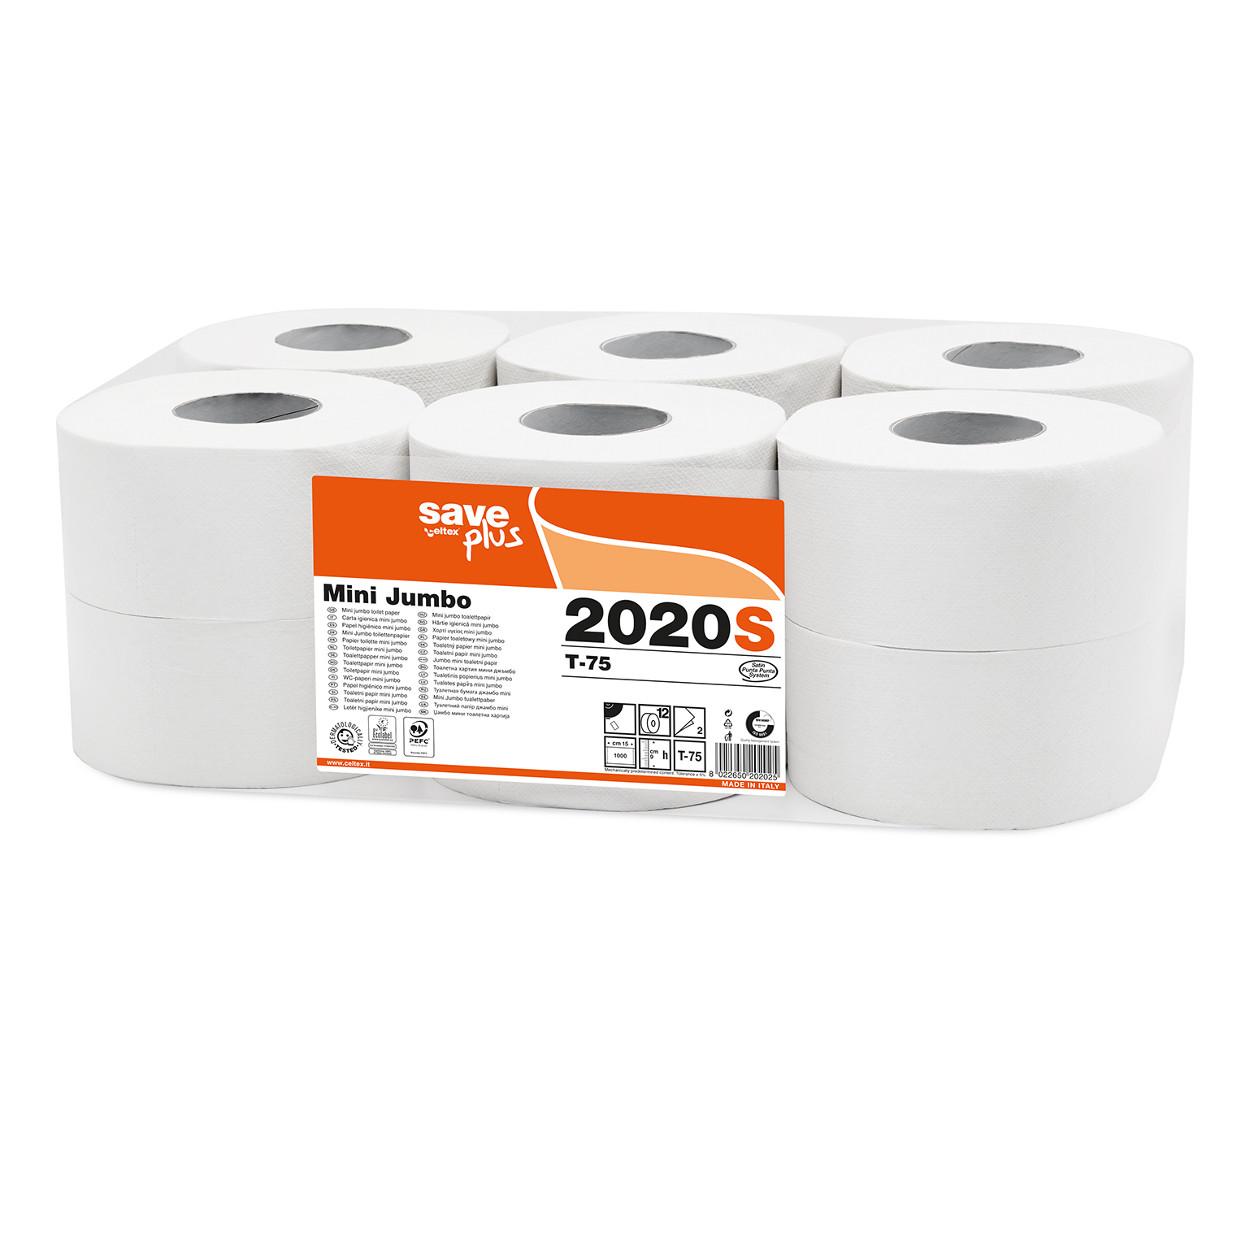 Toaletný papier Jumbo MINI Plus